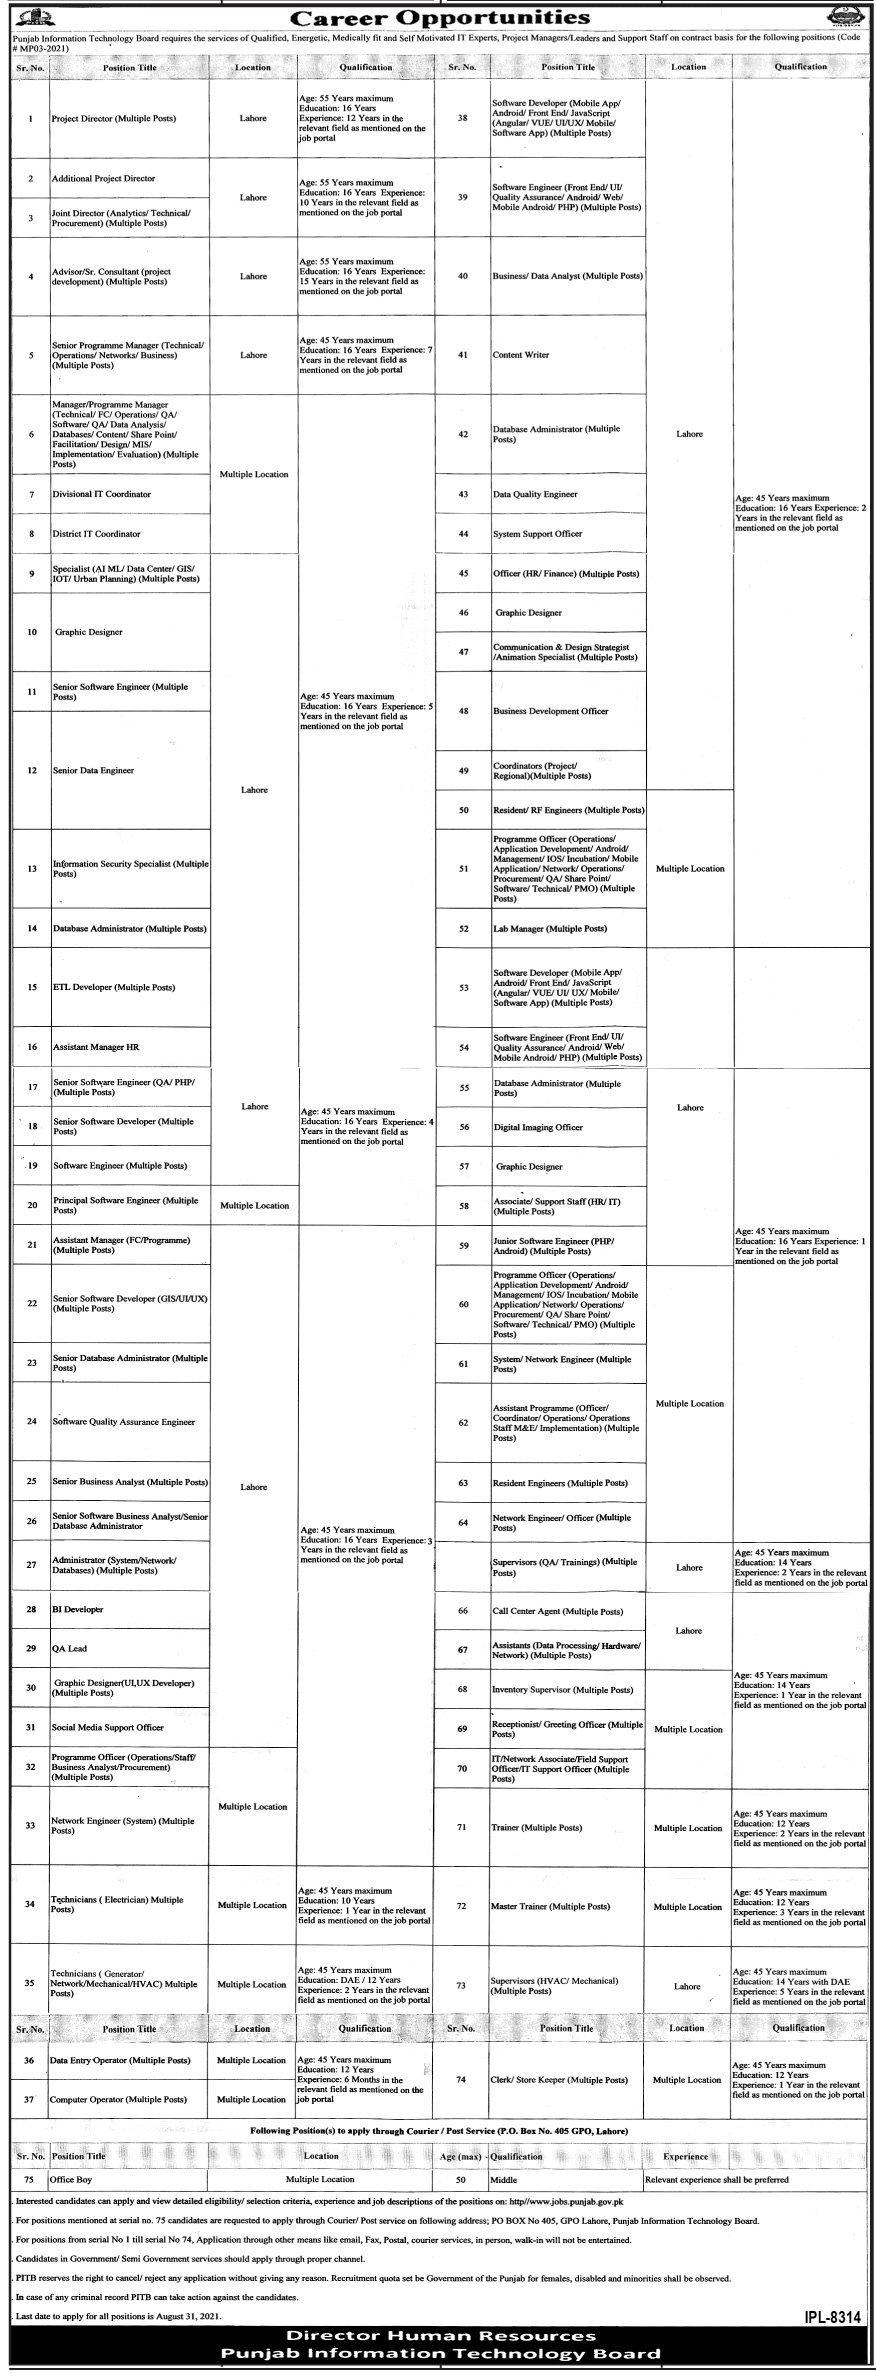 Punjab Information Technology Board Jobs 2021 For Management Staff